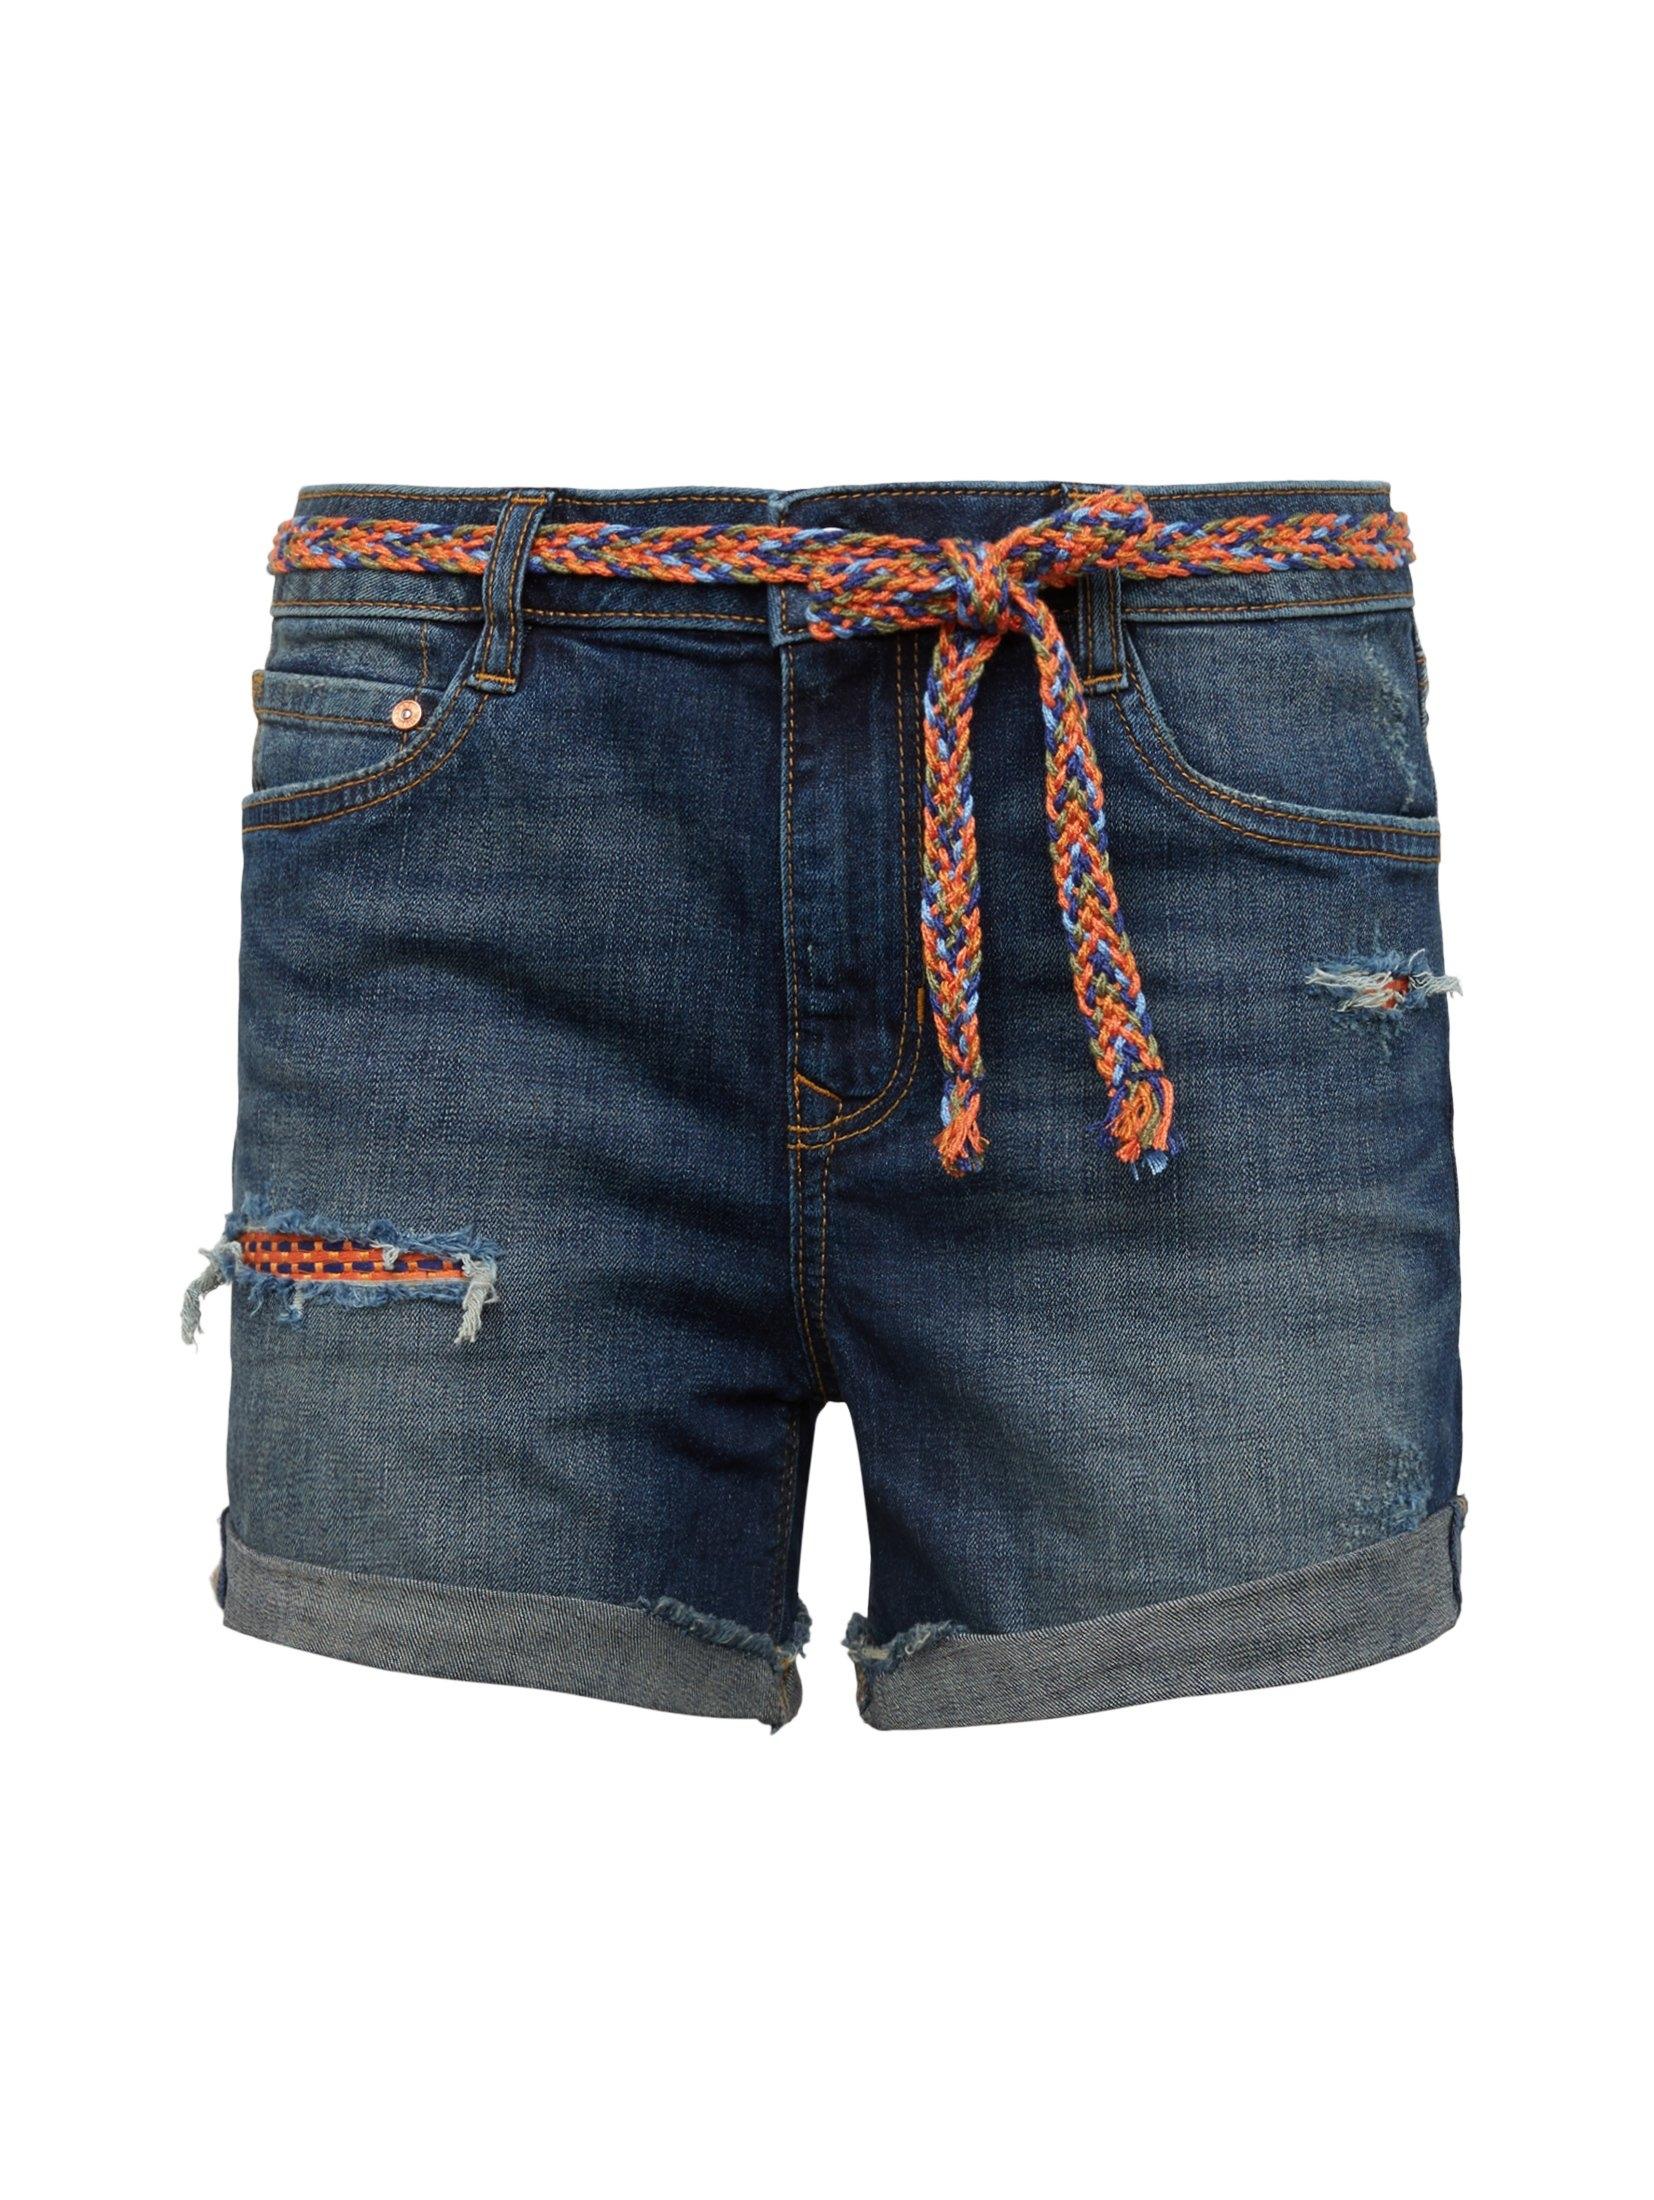 Tom Tailor Nu Jeansshortcajsa Kopen Online Shorts Denim QdoBsCthrx